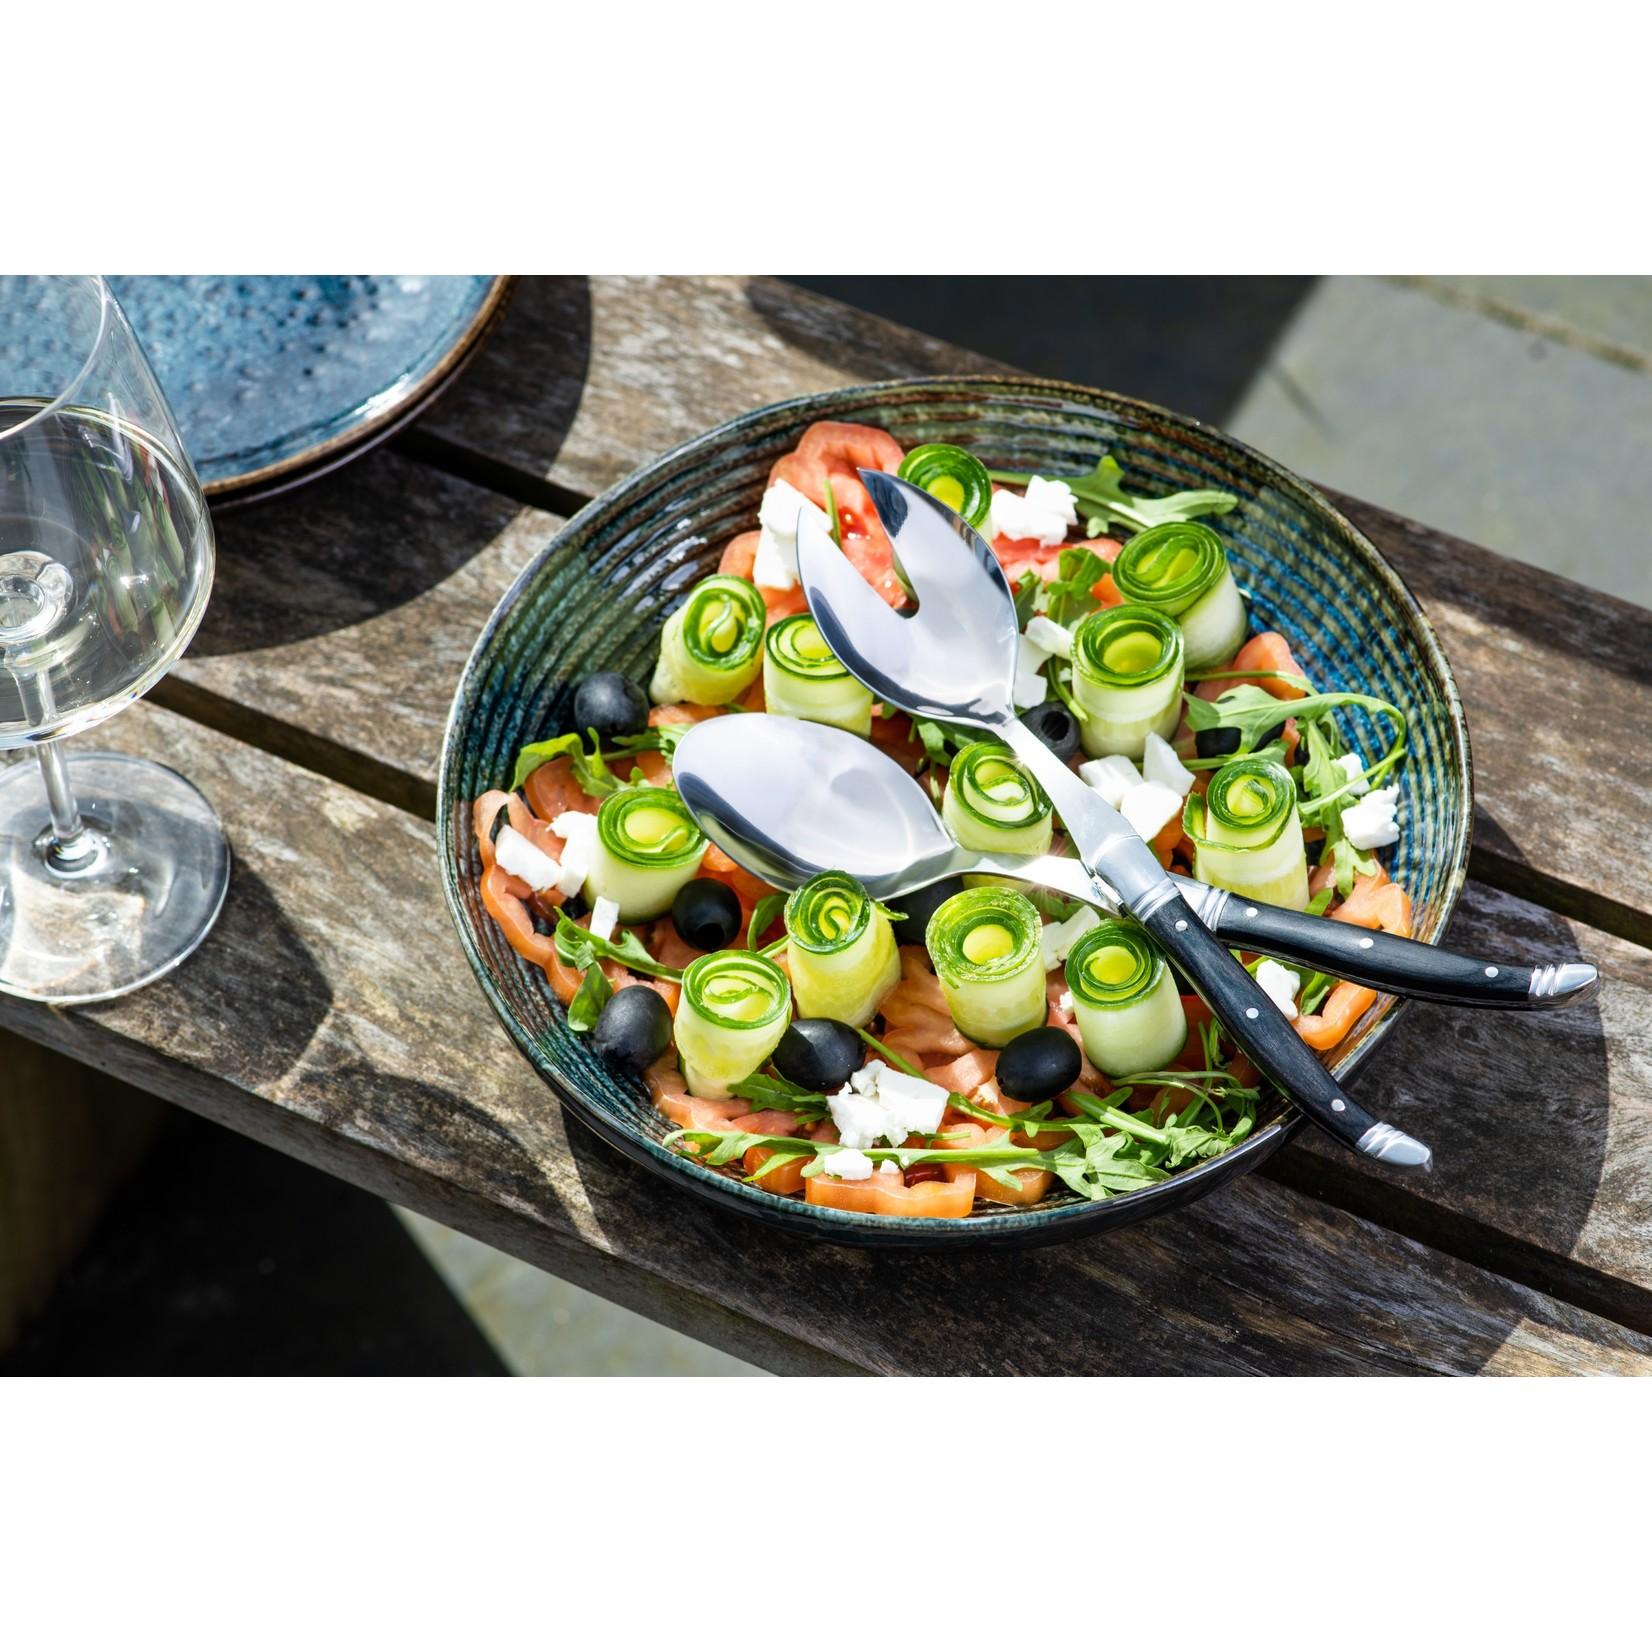 Laguiole Style de Vie Laguiole Style de Vie Luxury Line saladecouvert 2-delig ebbenhout